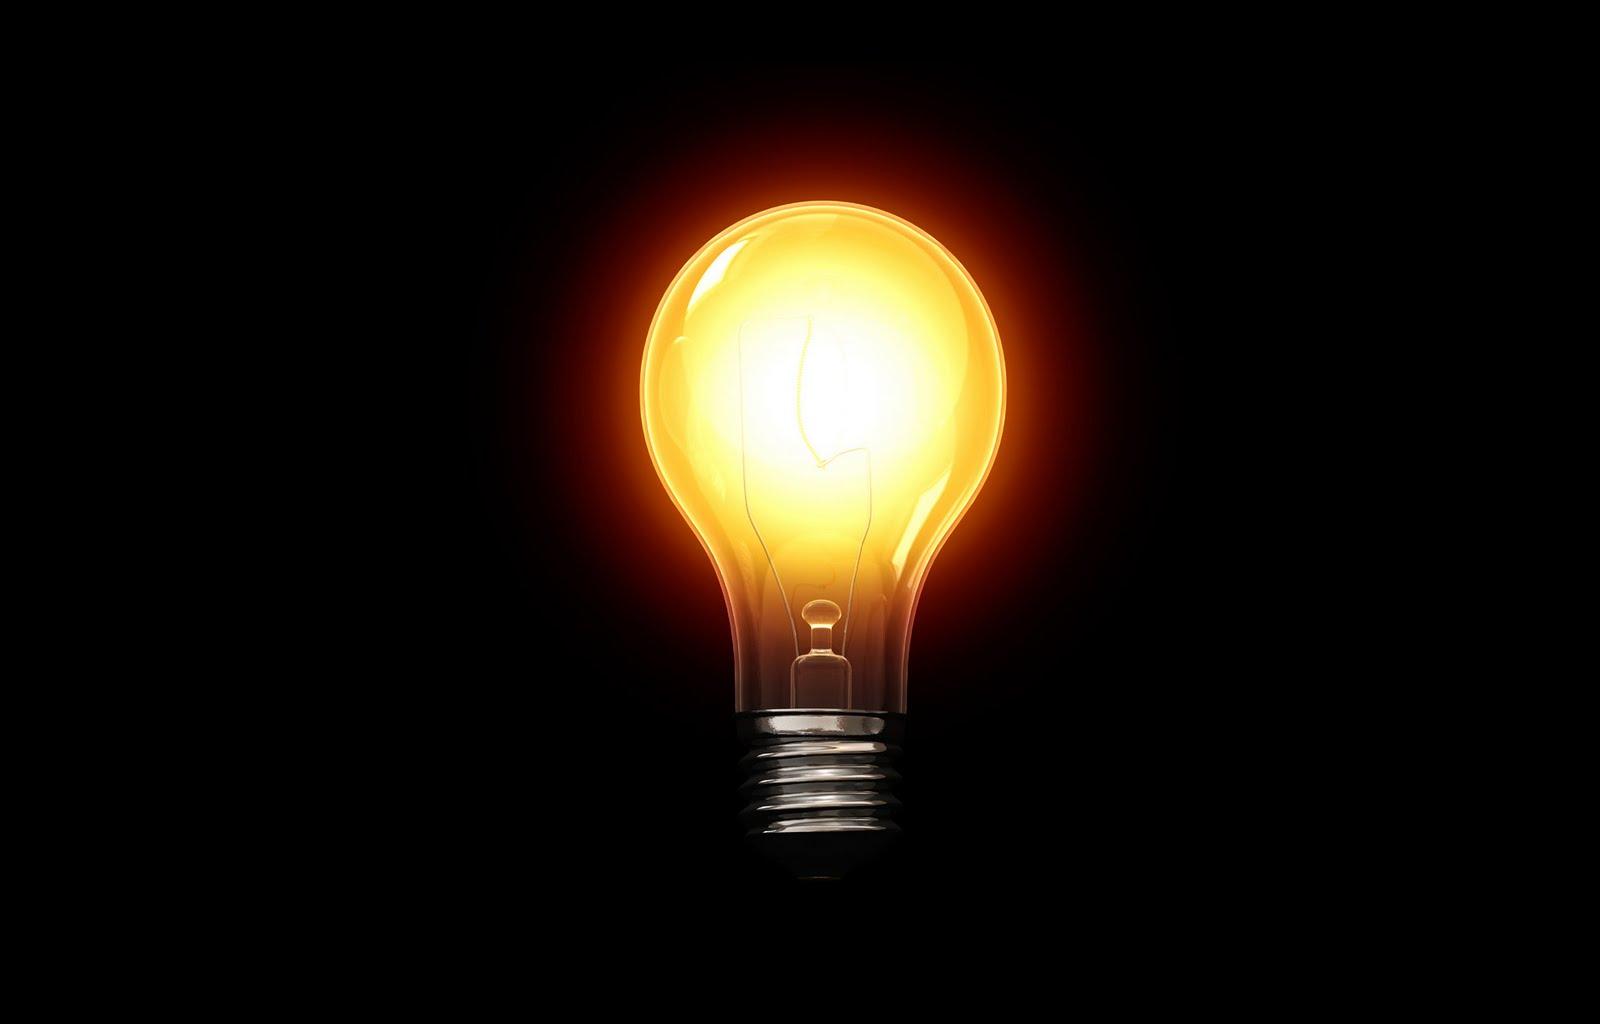 MyNewsLinx: Europe's light-bulb socialism